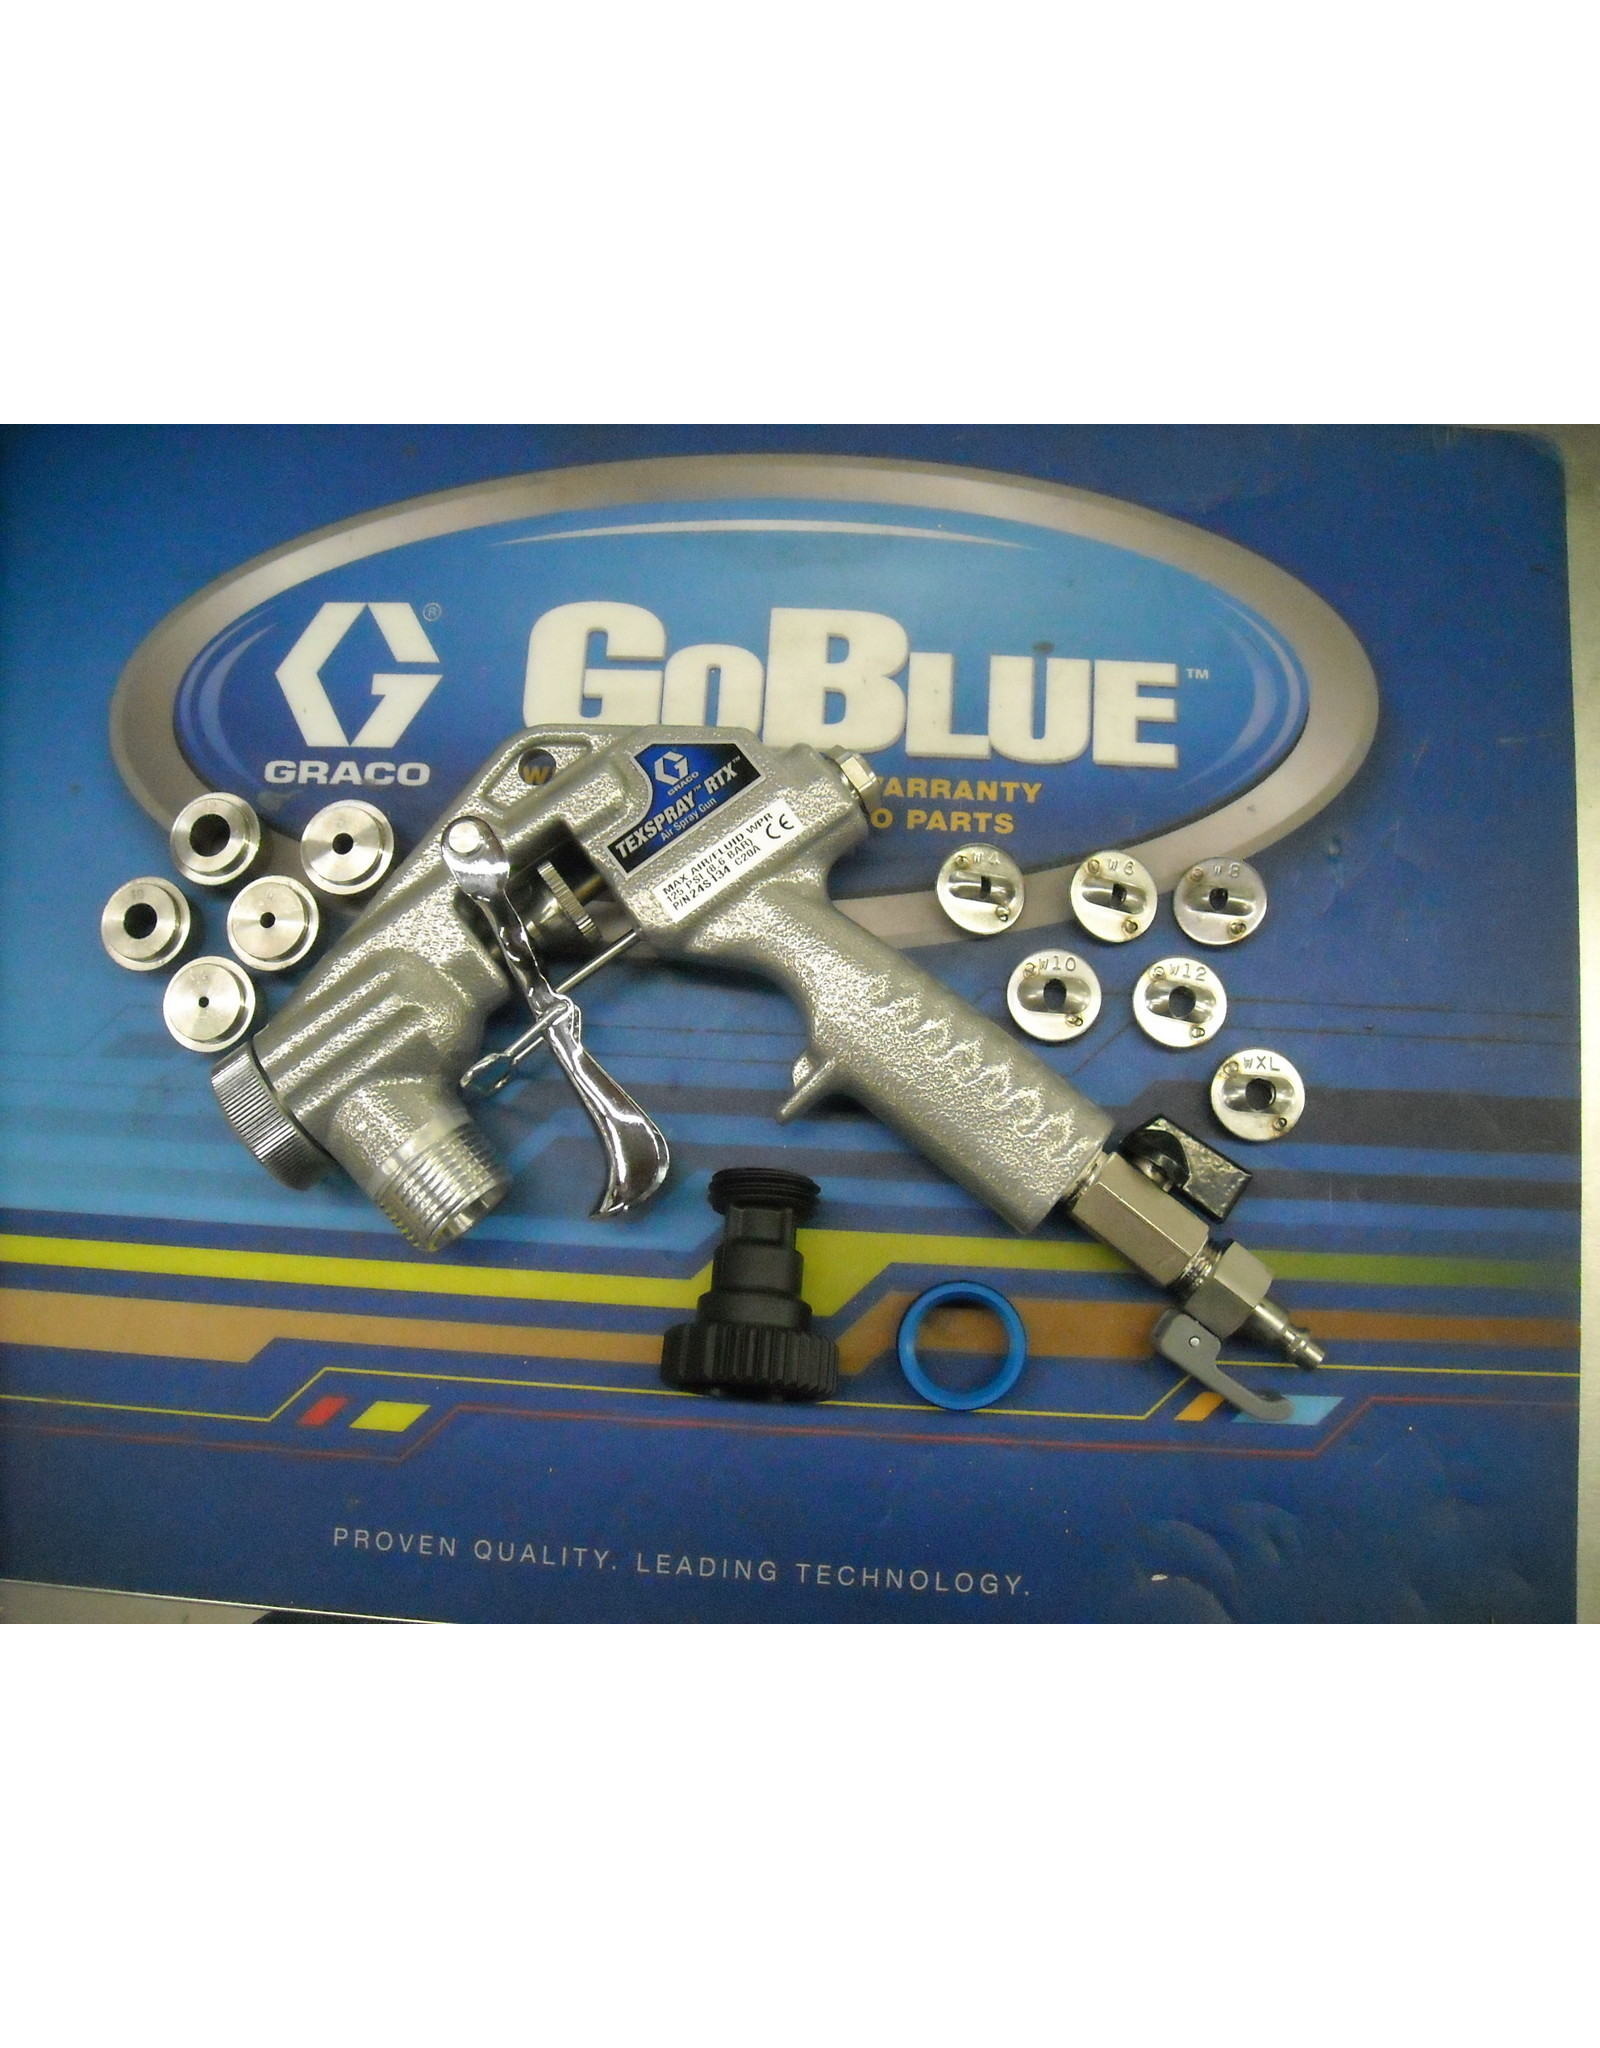 Graco 24S134 Texture Gun Kit